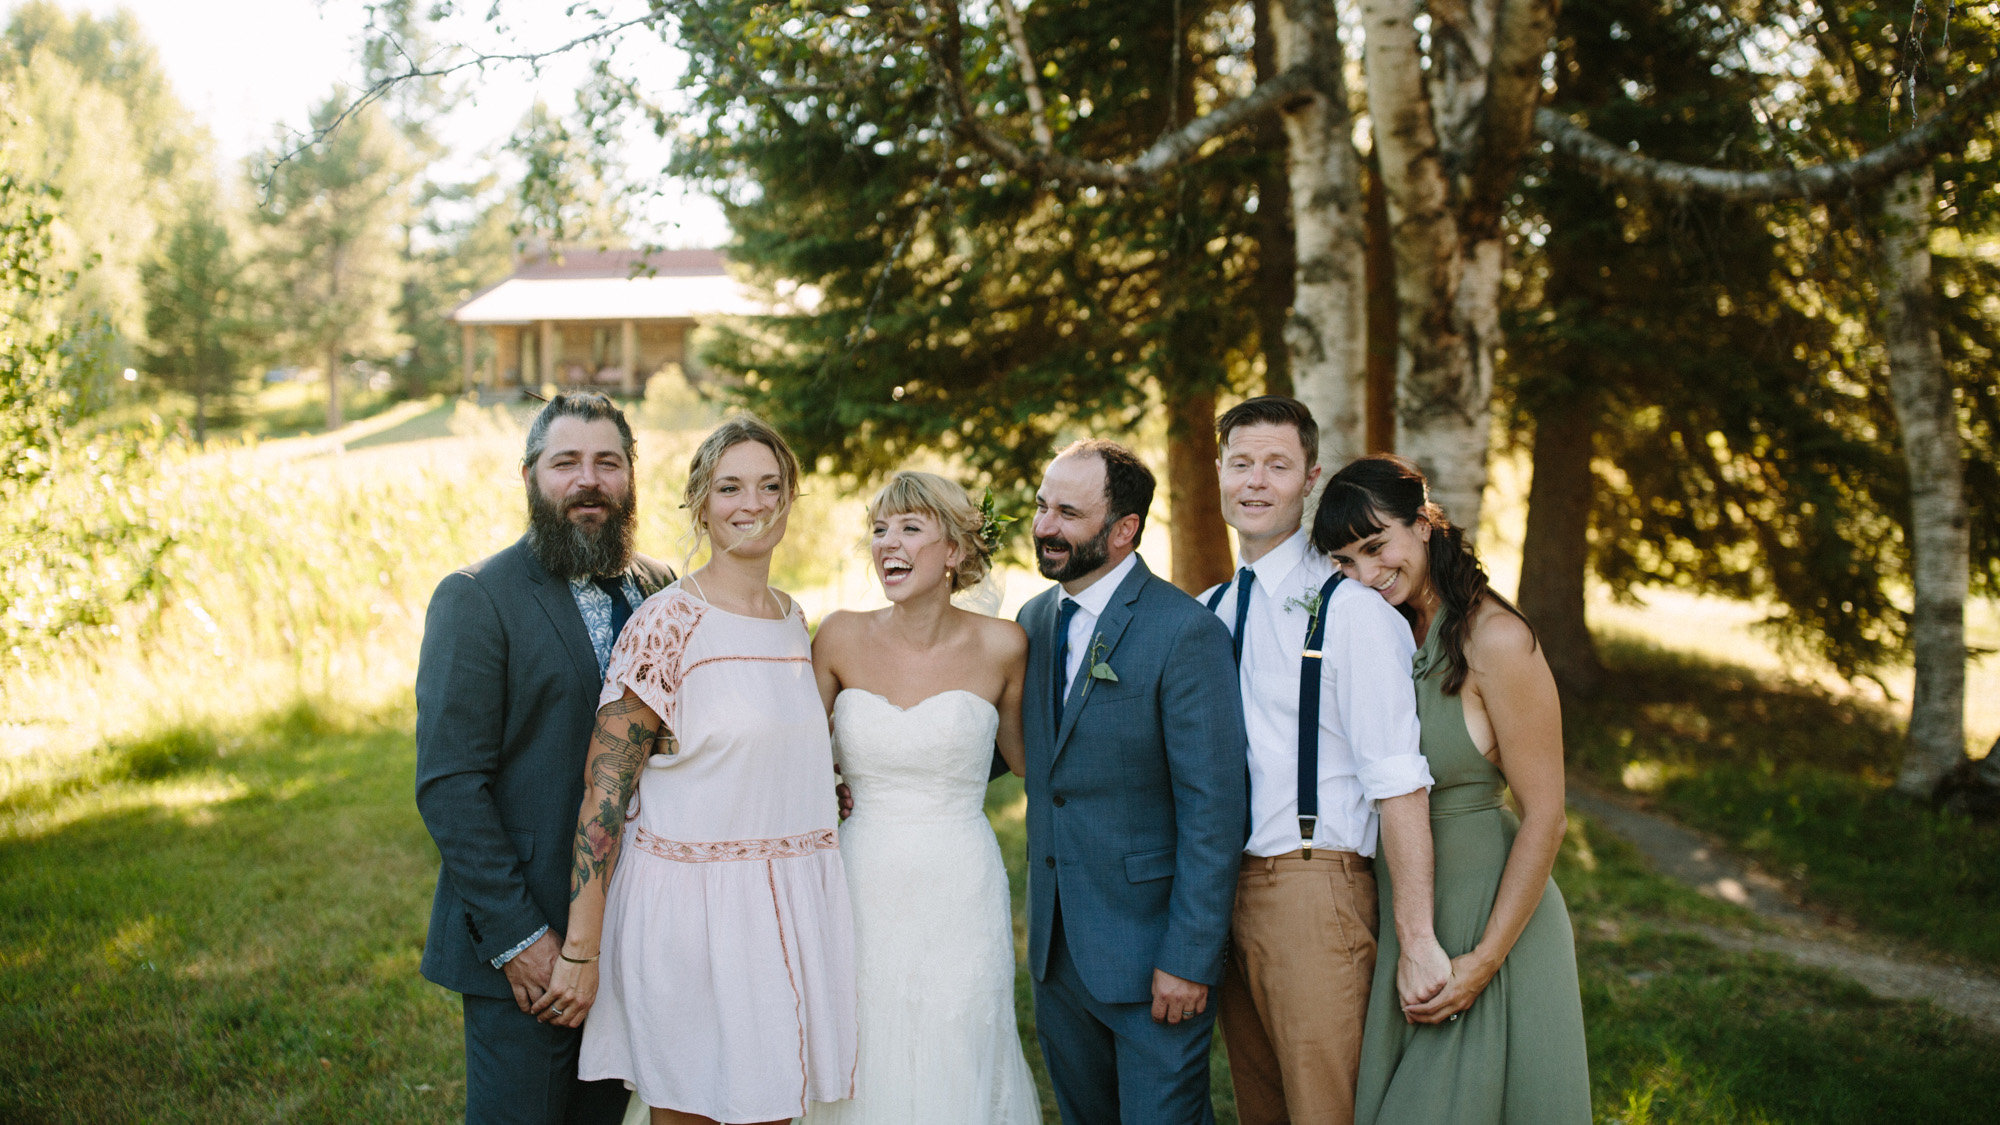 Montana_Wedding_Photos_alec_vanderboom-0107.jpg